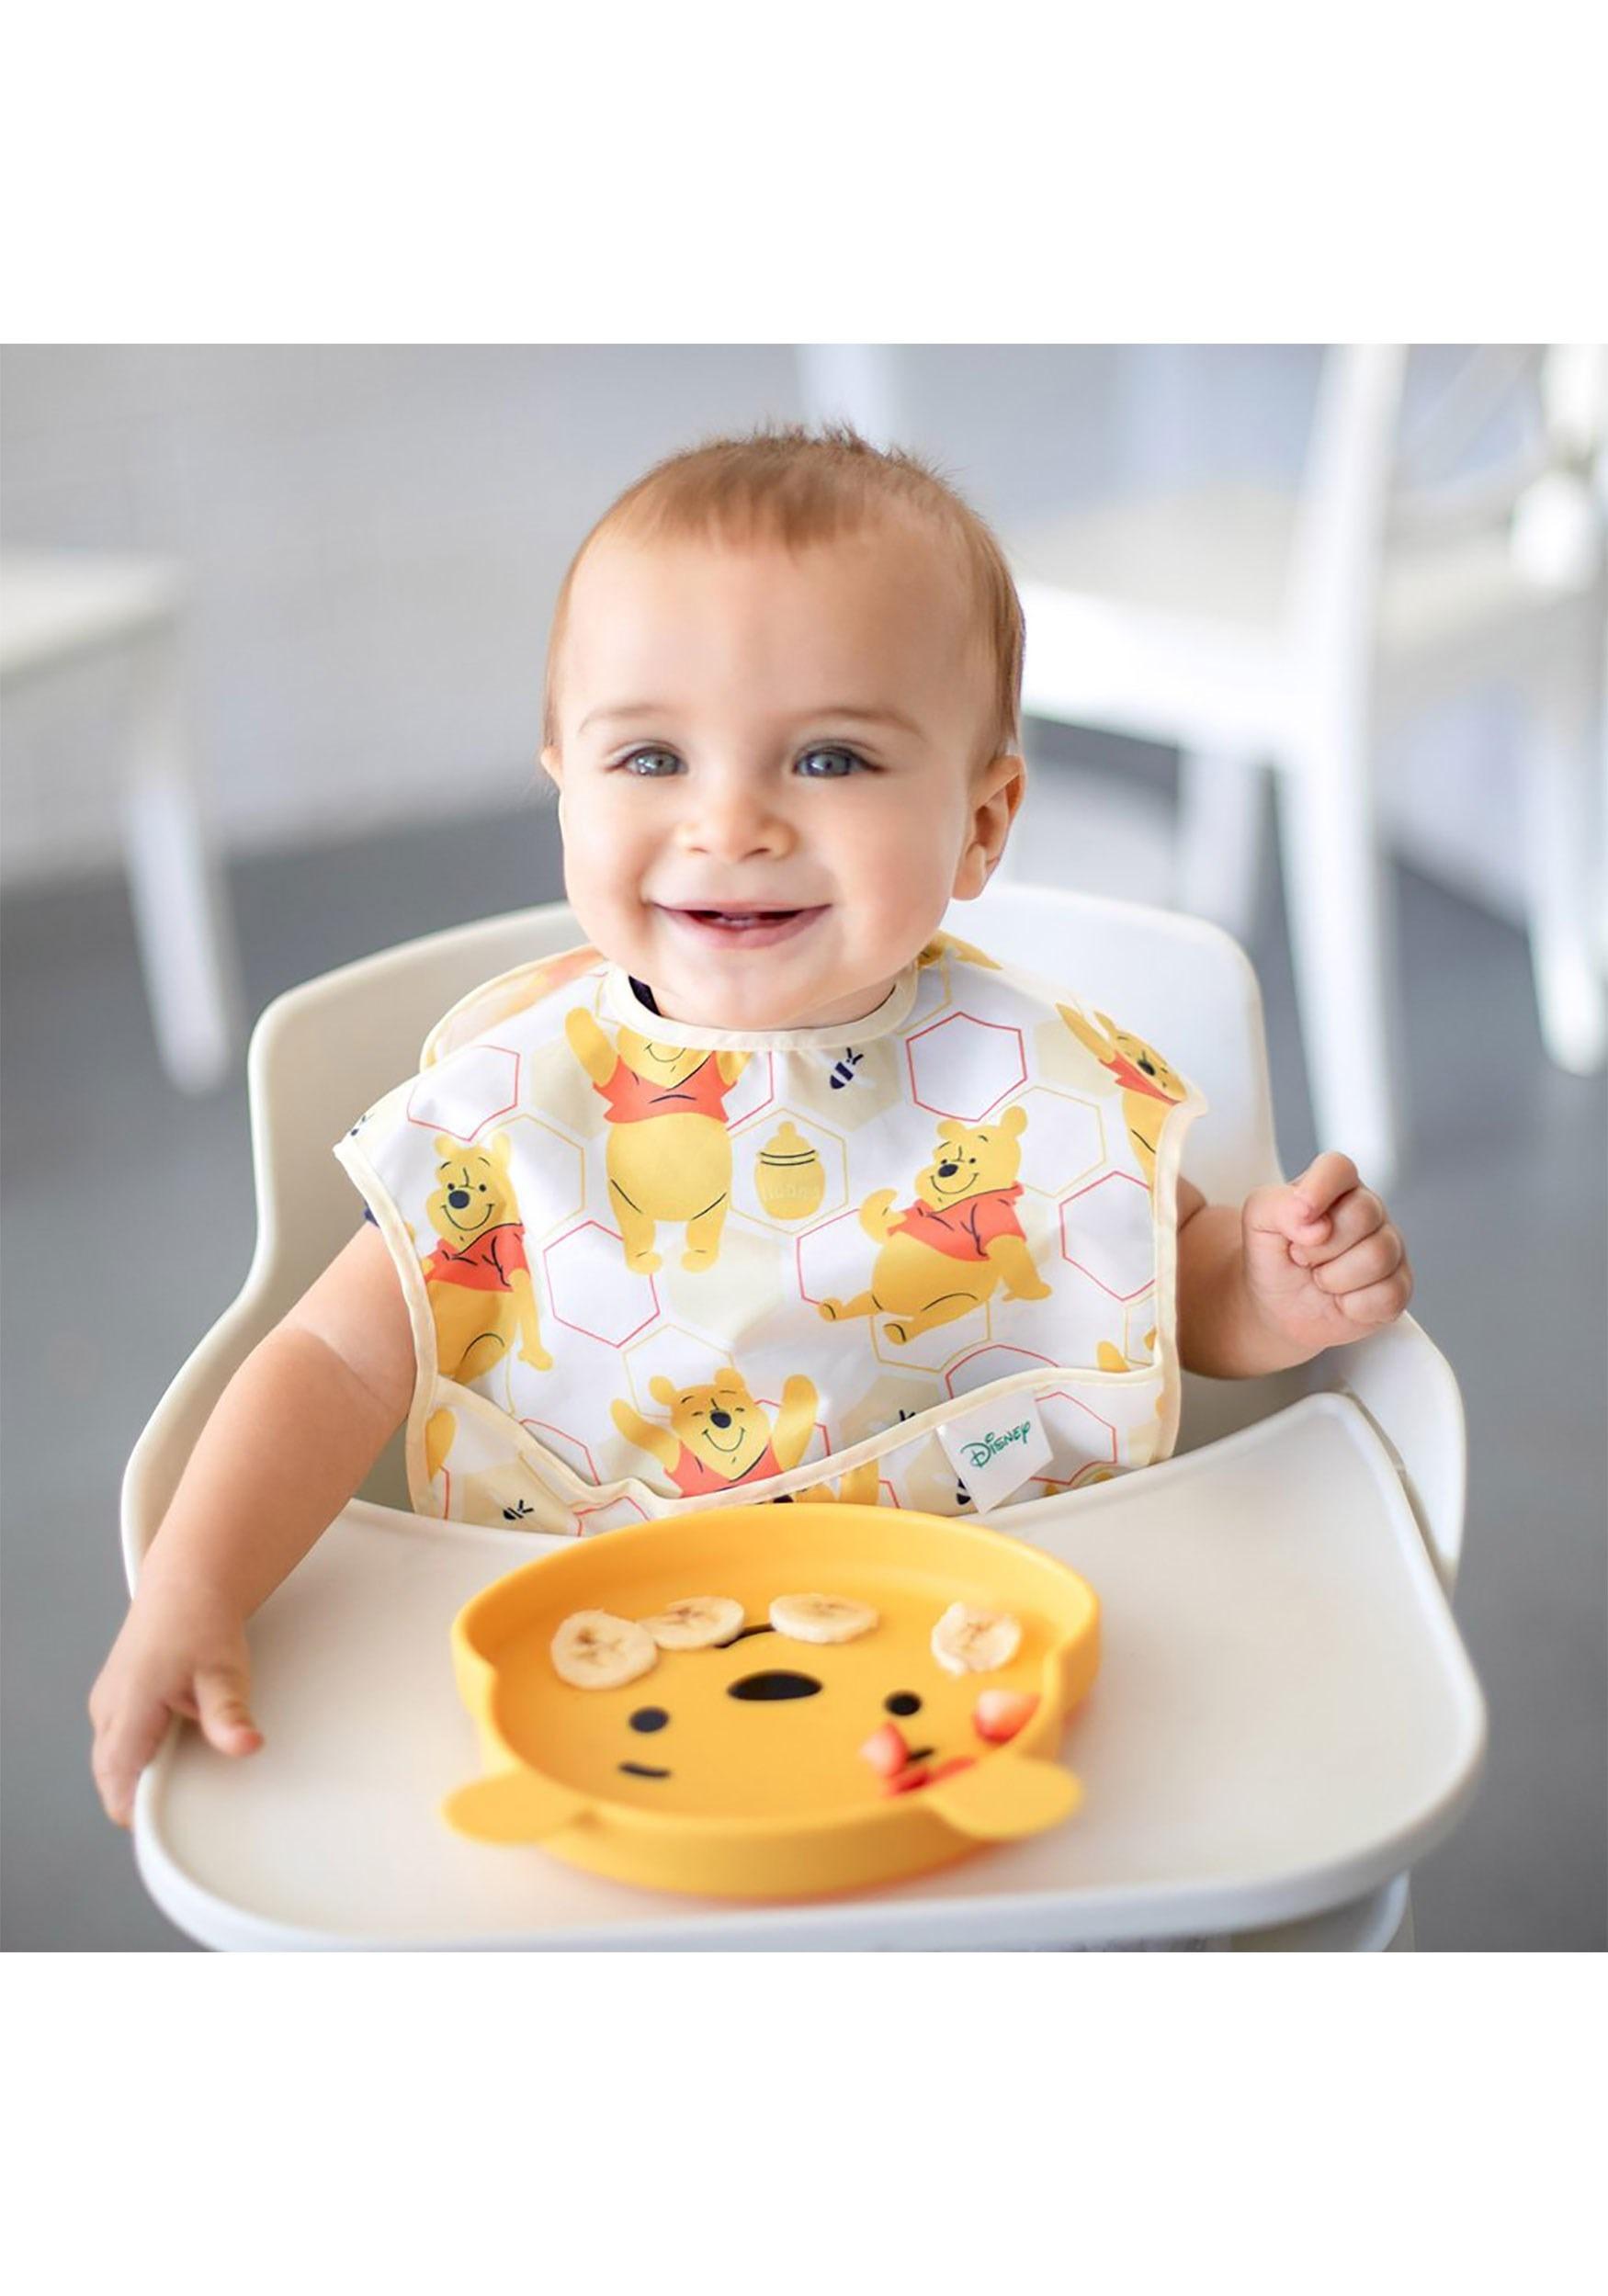 Winnie the Pooh SuperBib Hunny 2-Pack (6-24 months)